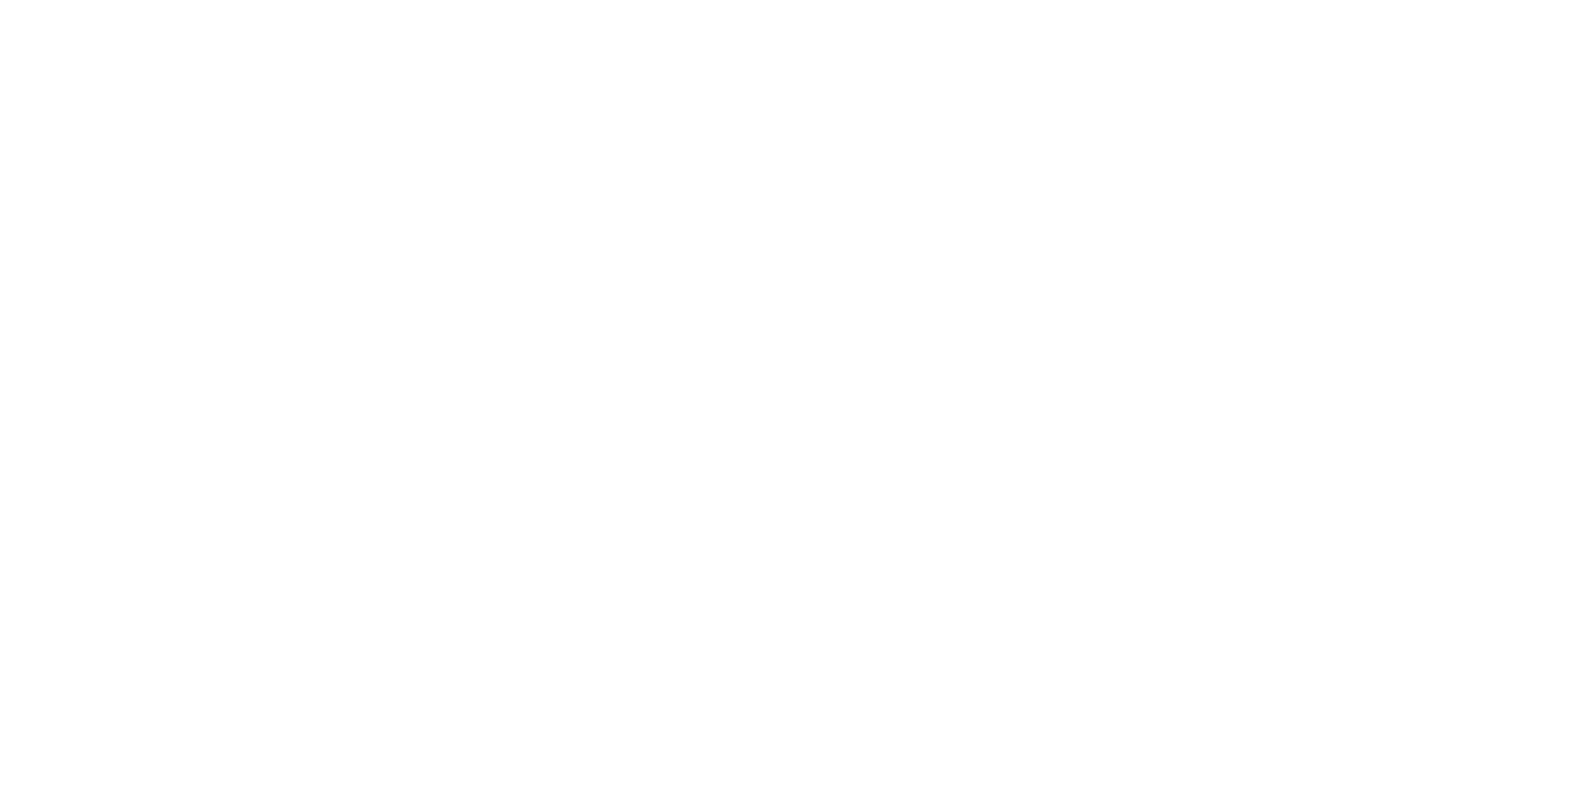 Georg Emrich / Diverses